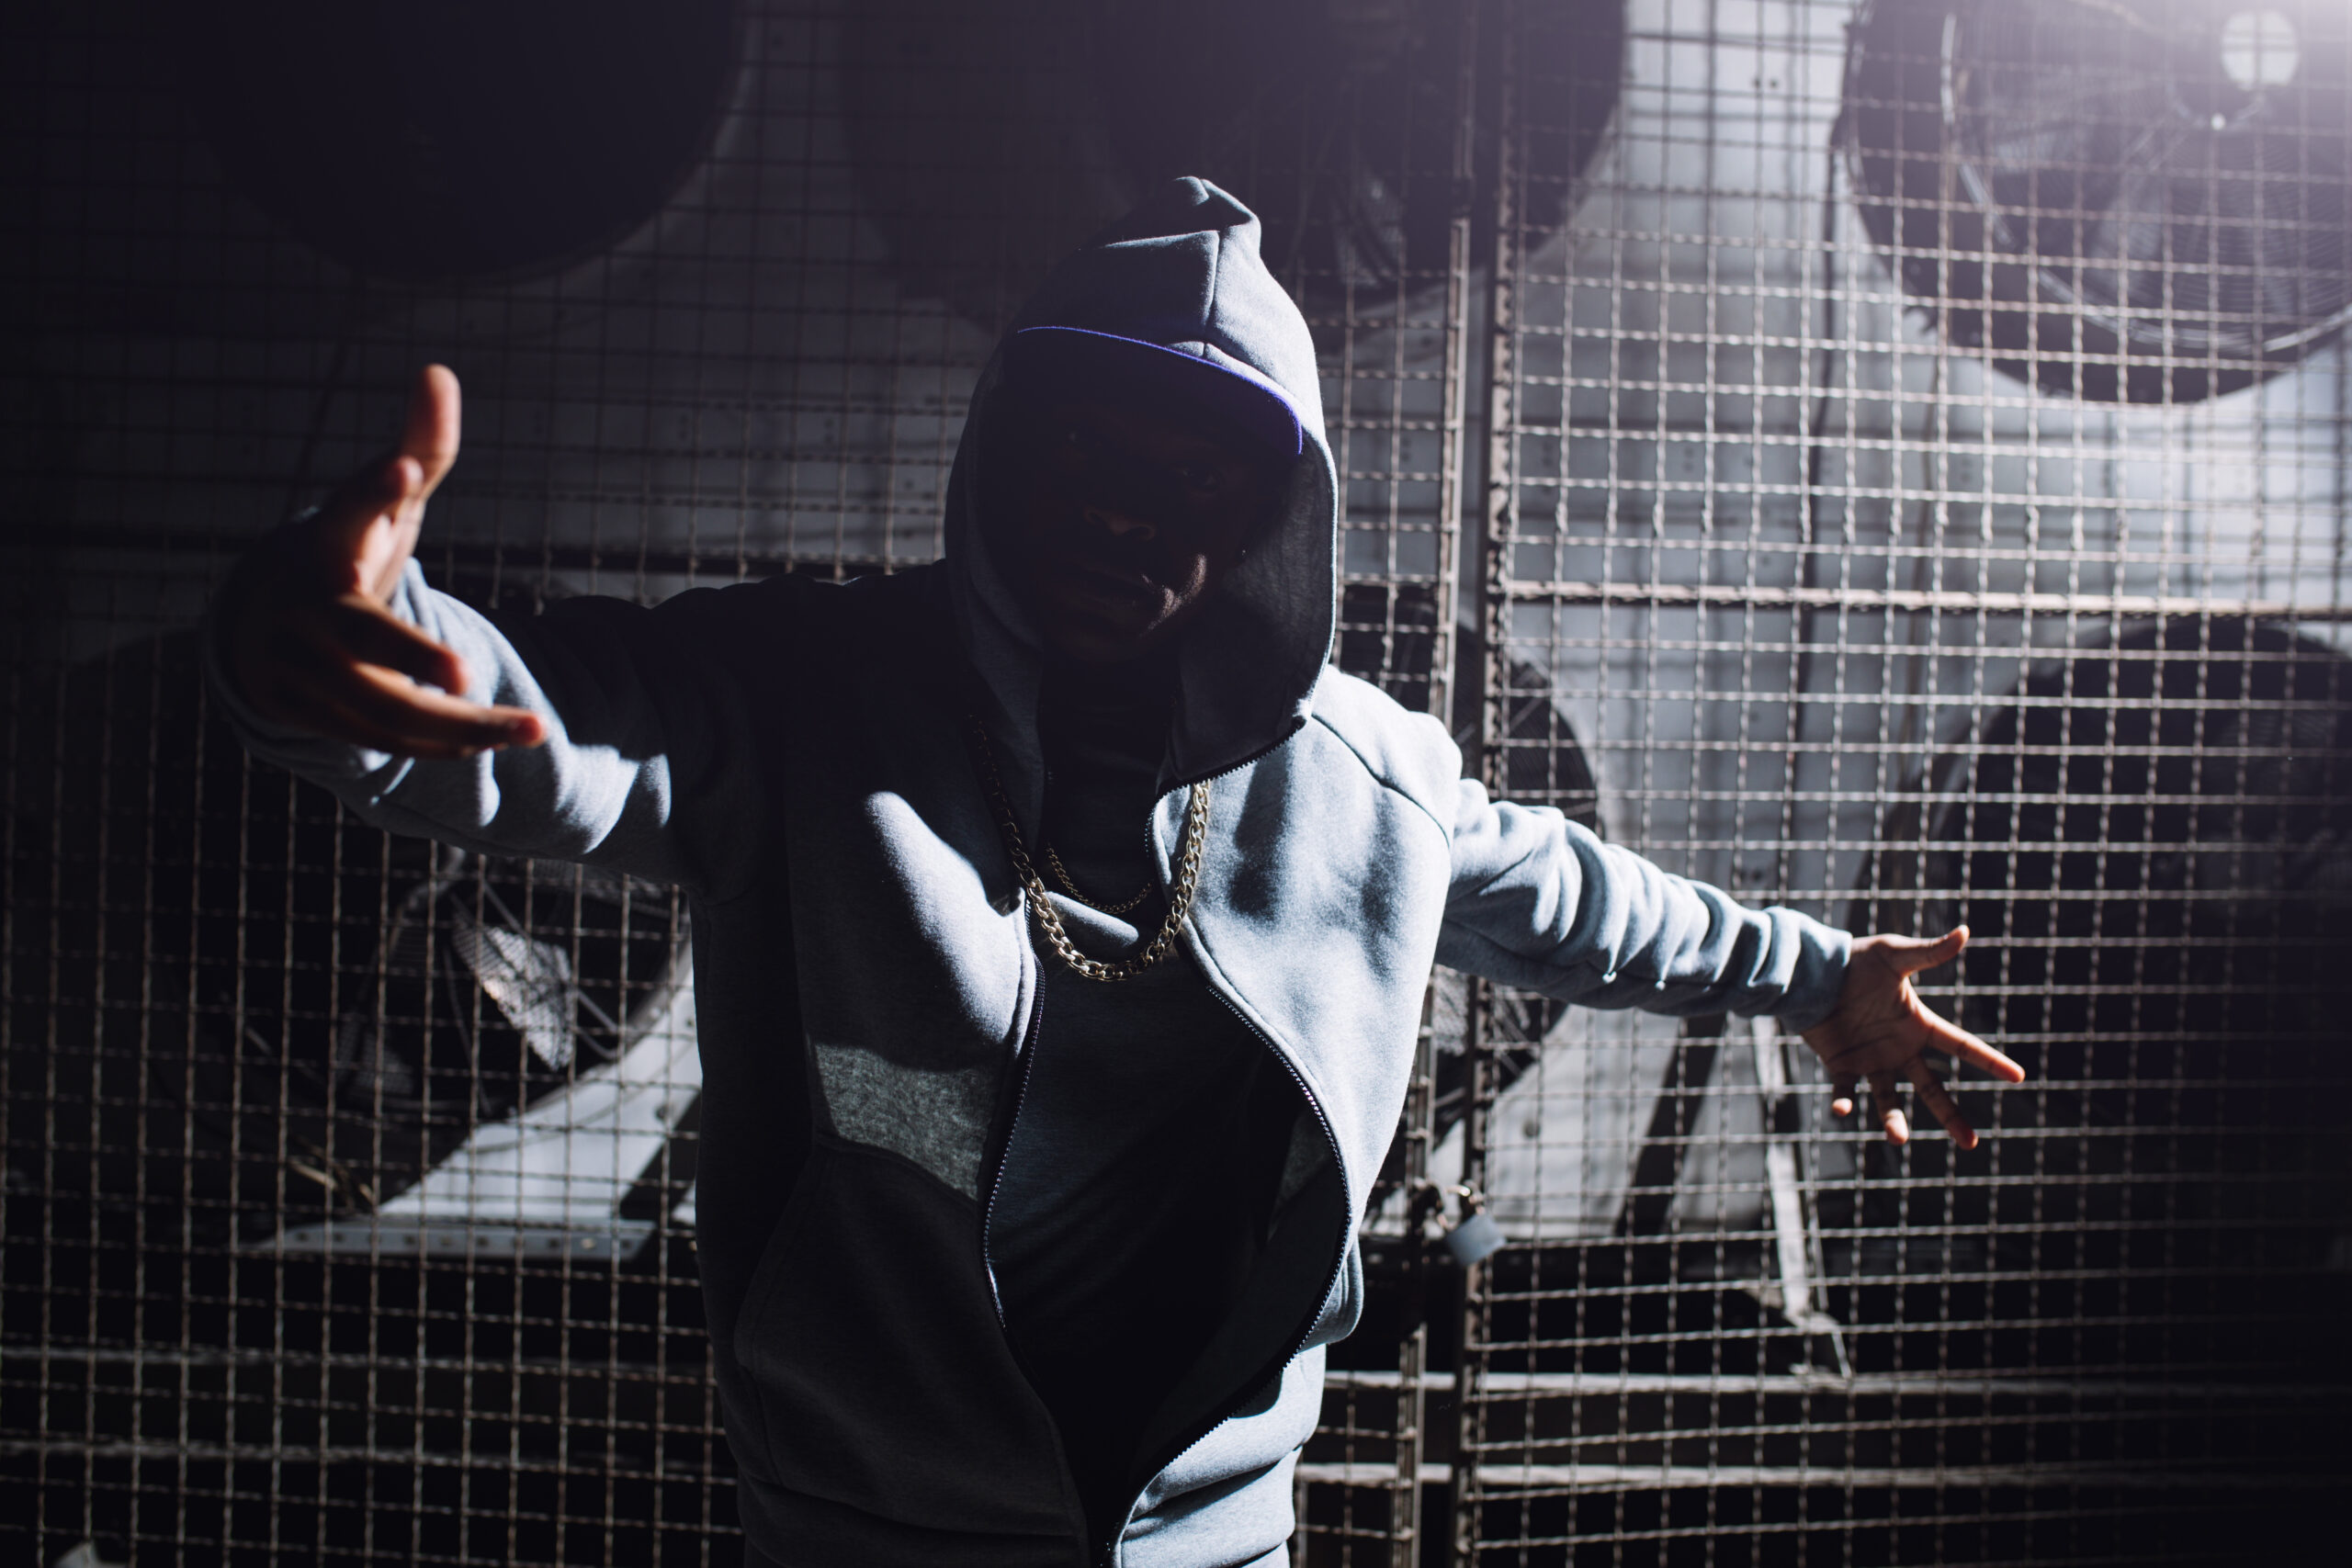 klasyka polskiego rapu, rap lat 2000, raper